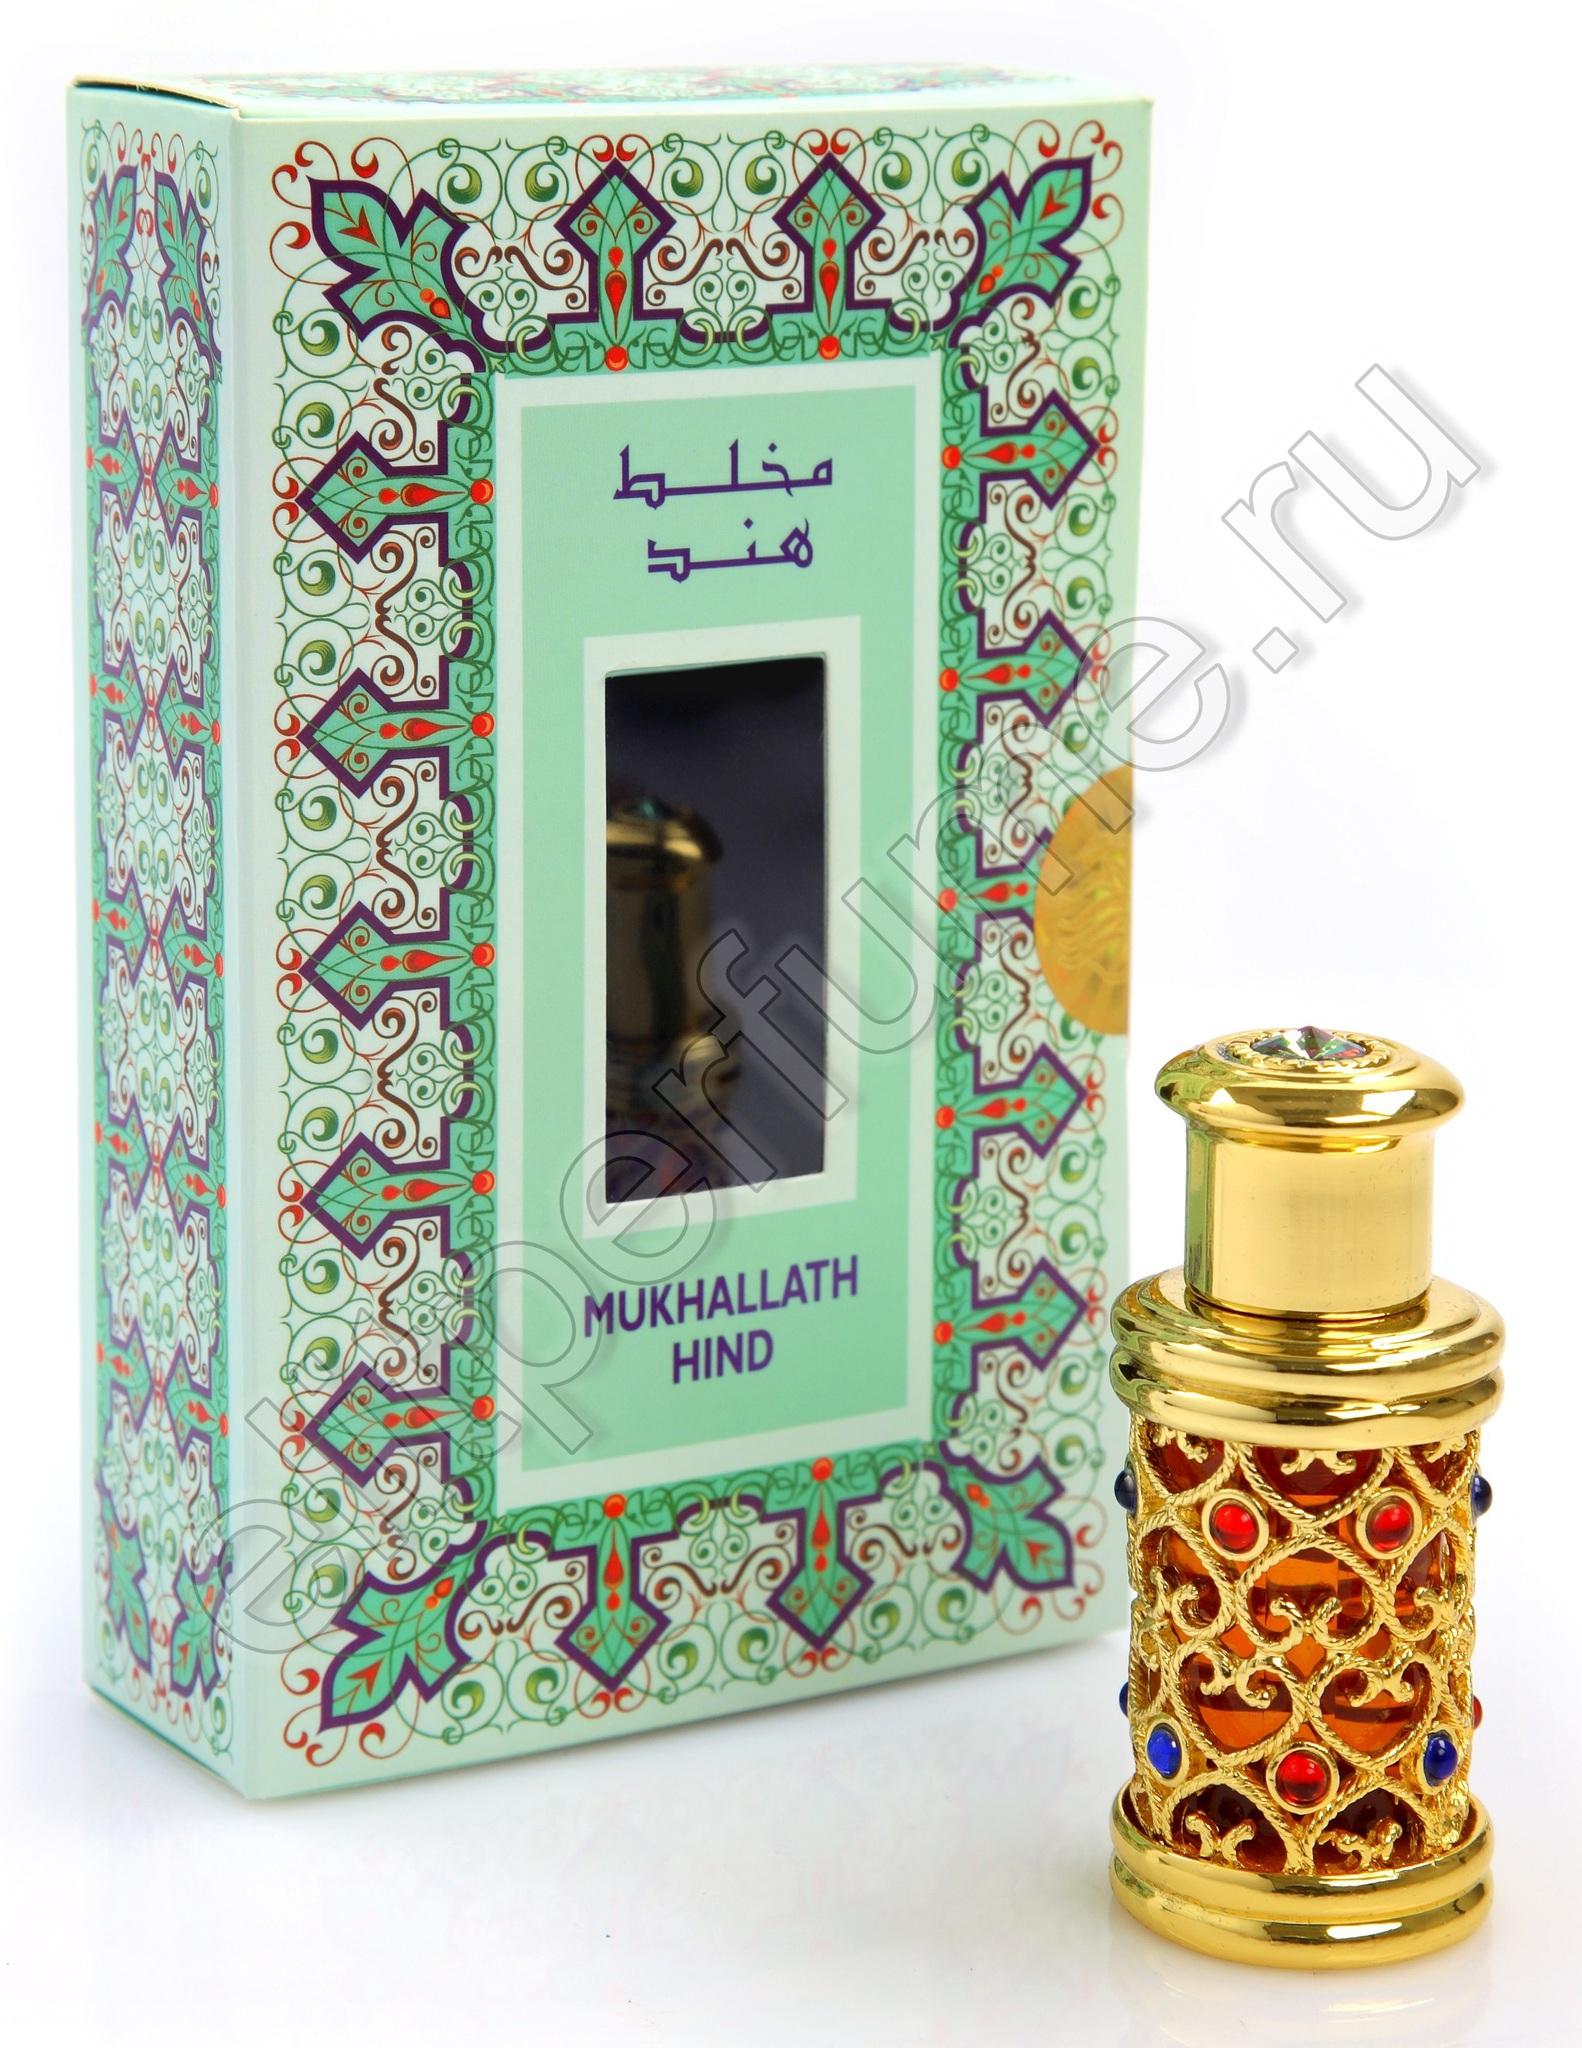 Мухаллат Хинд Mukhallath Hind 12 мл арабские масляные духи от Аль Харамайн Al Haramain Perfumes